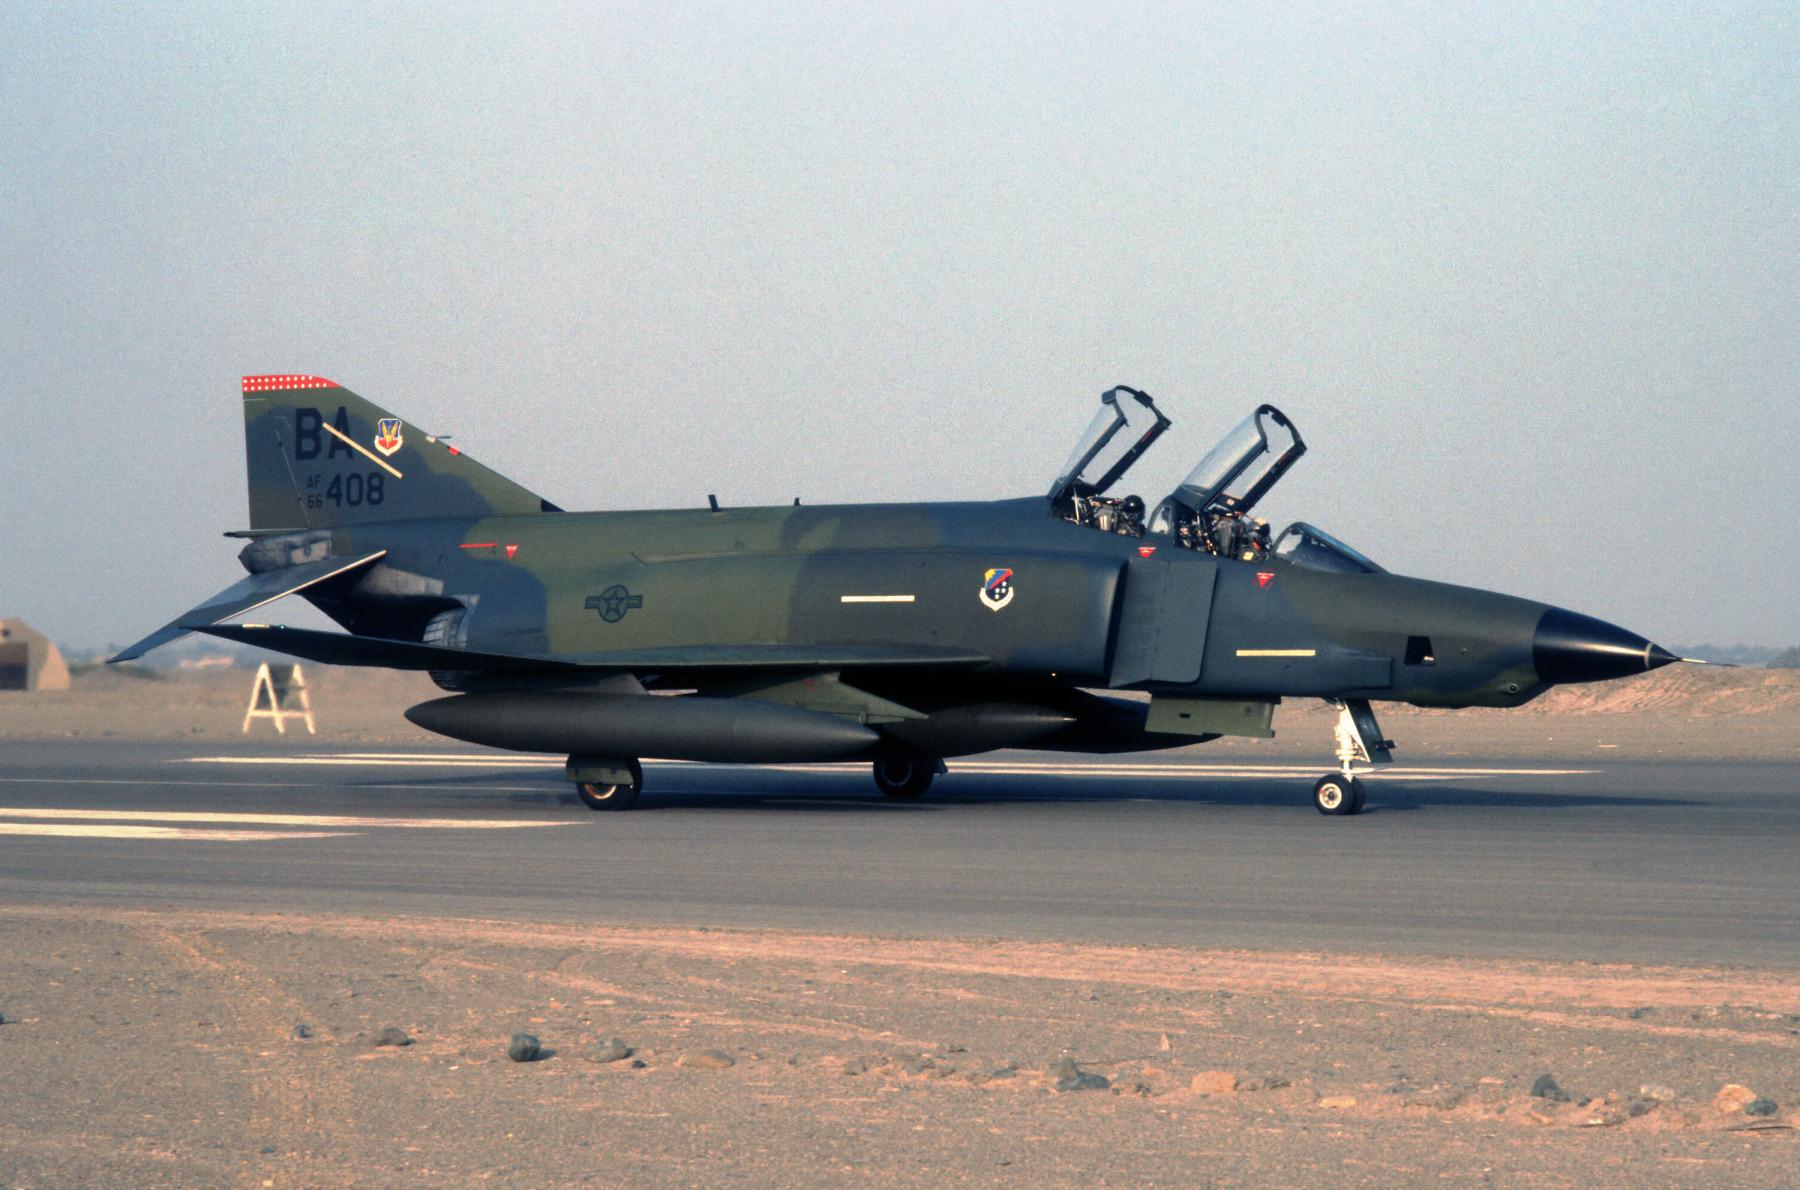 df-st-88-05525